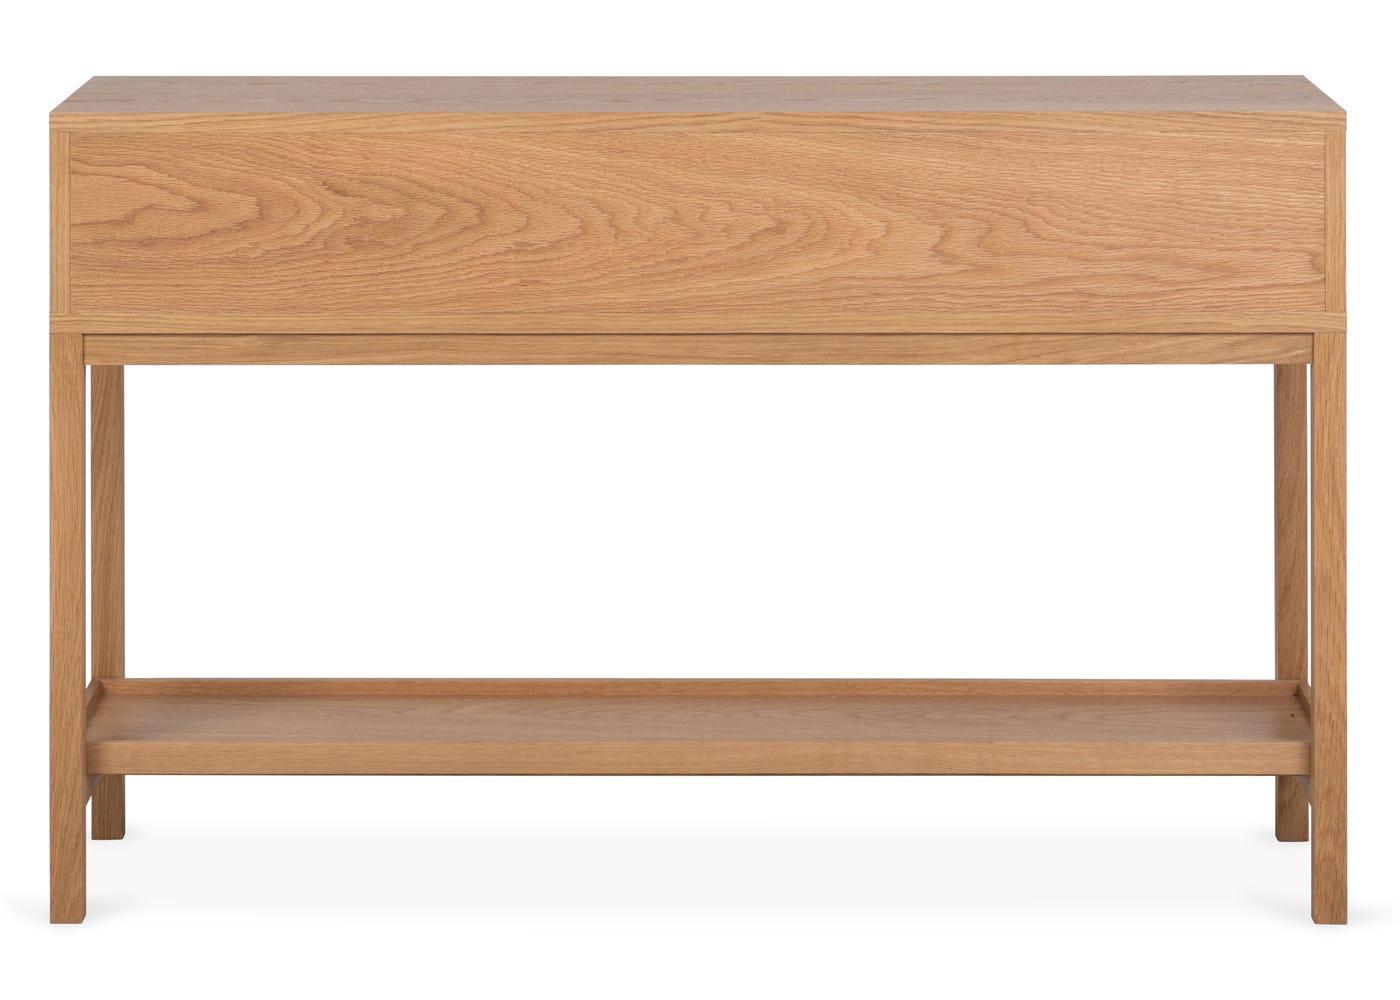 As shown: Verona oak console table - Rear profile.